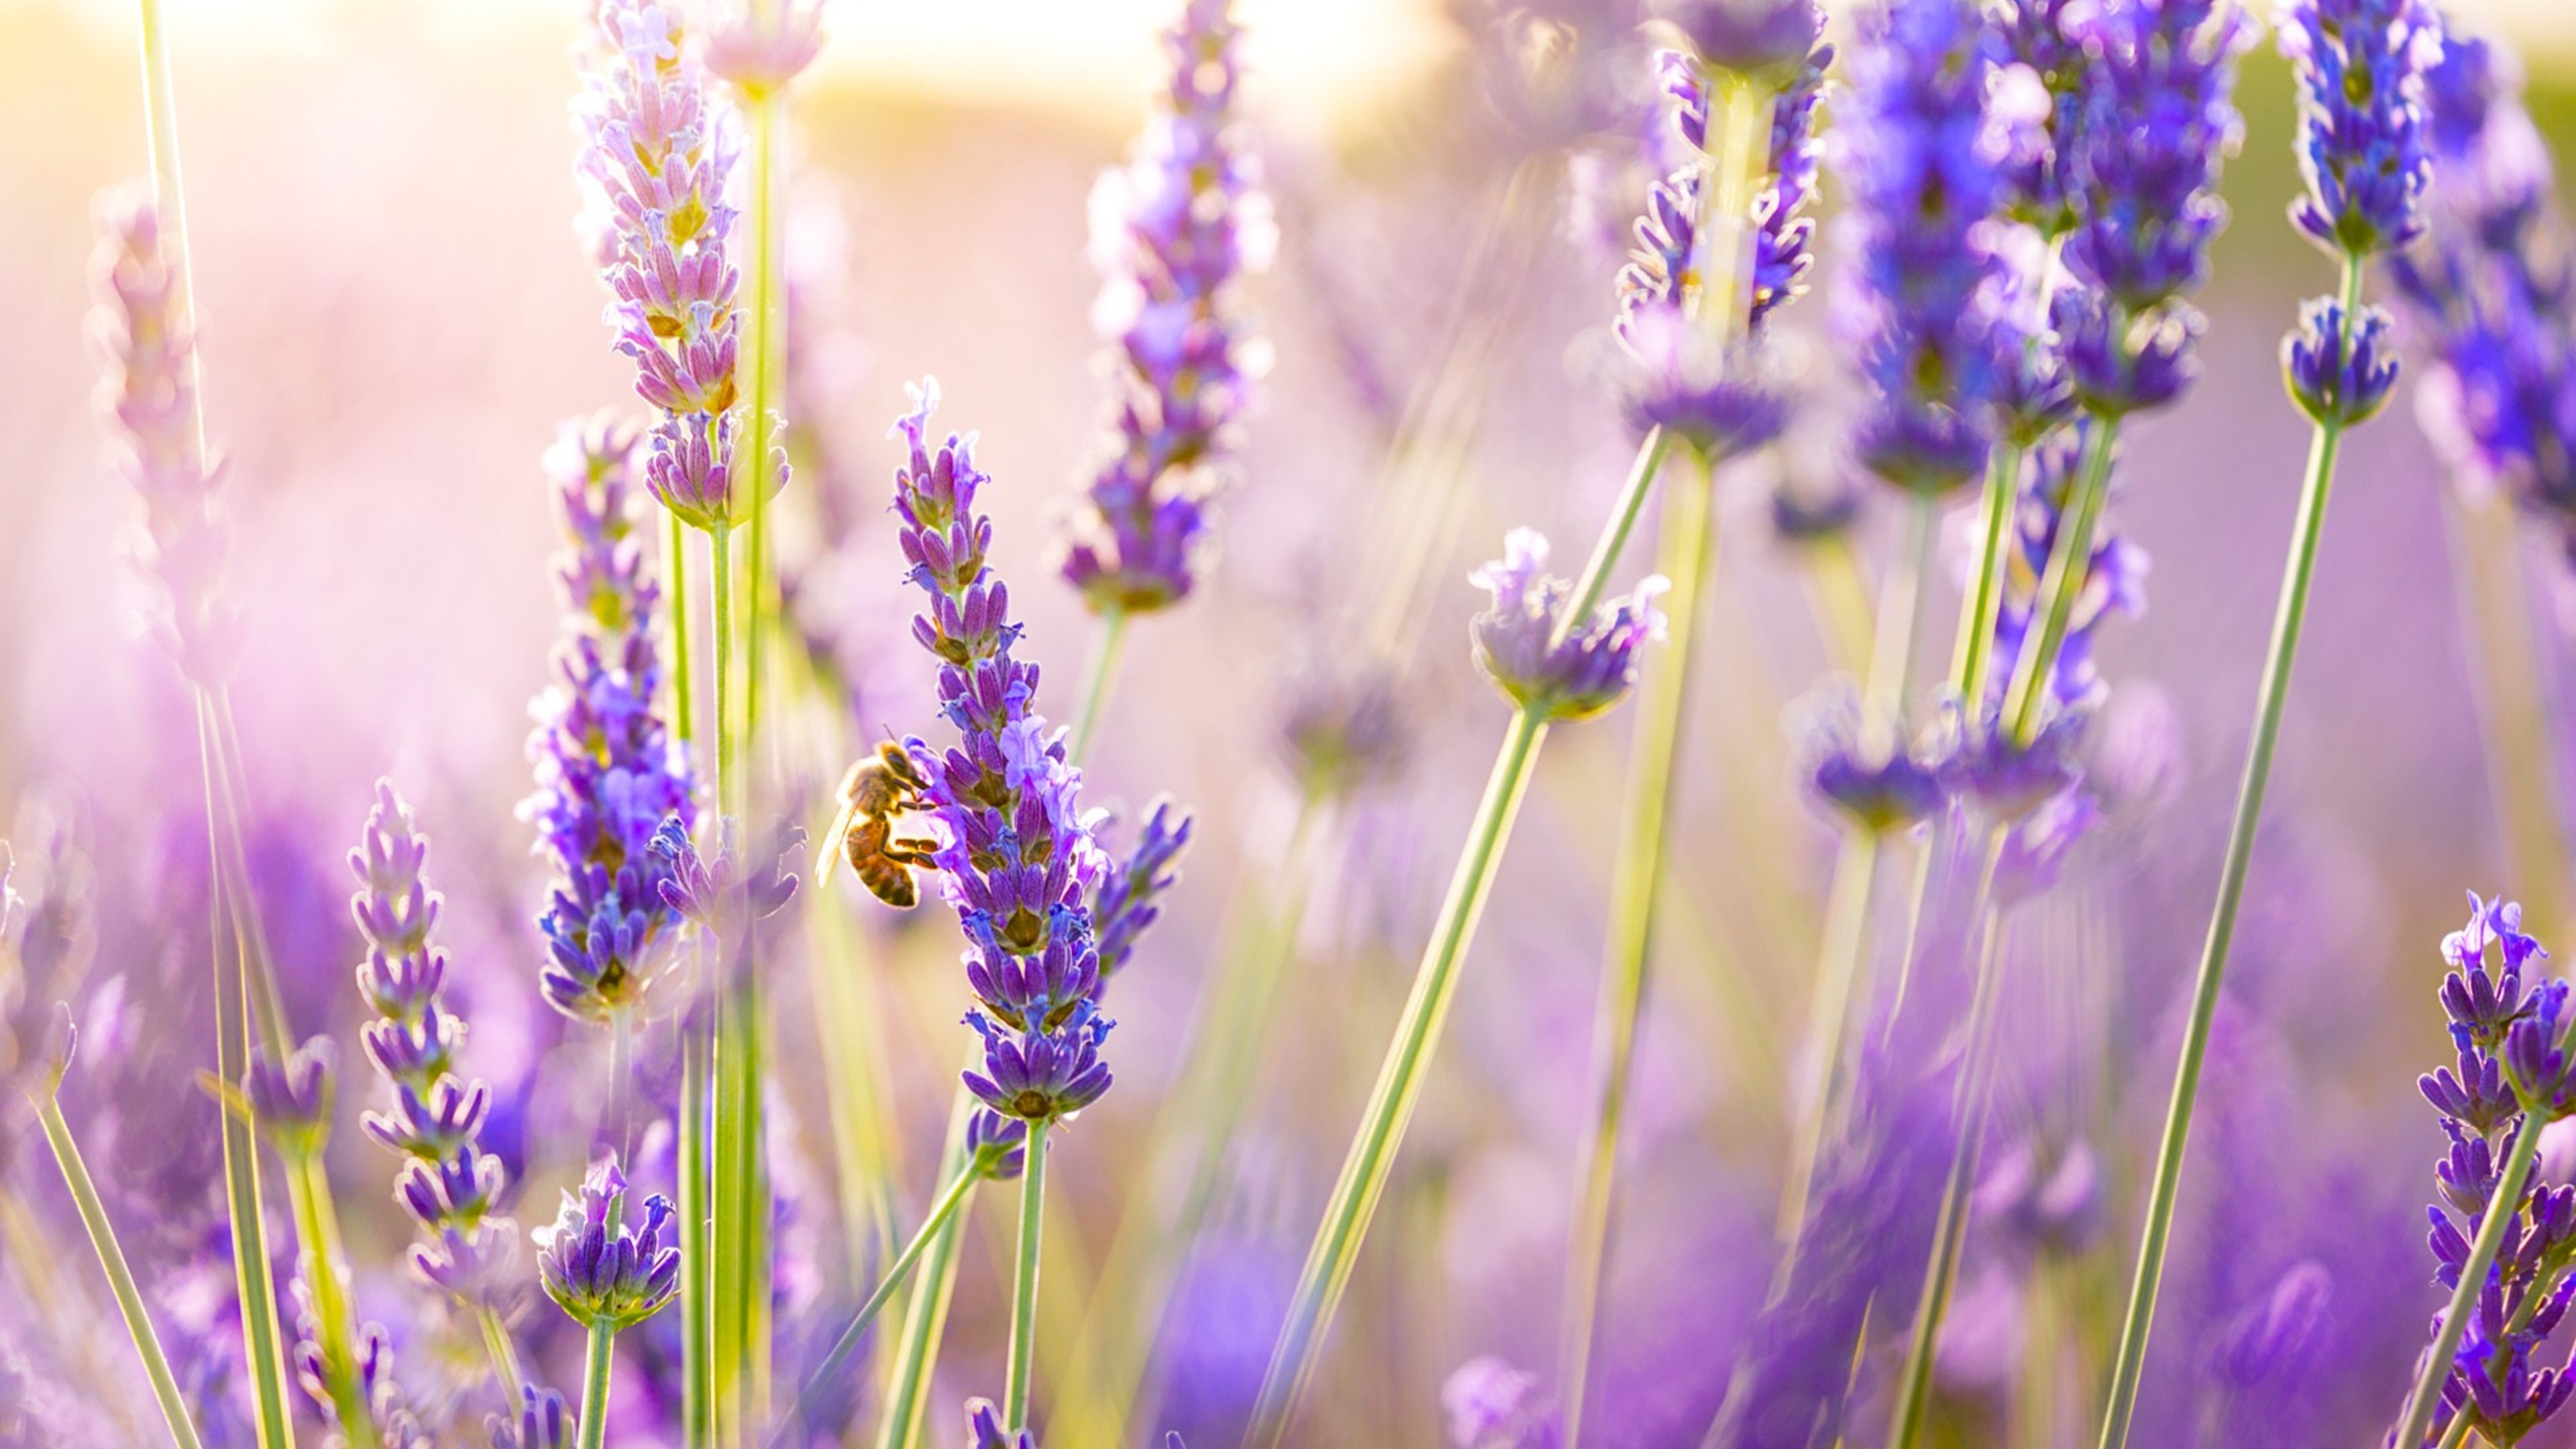 Lavender Wallpaper Lavender Wallpapers 31 Download 3840x2160